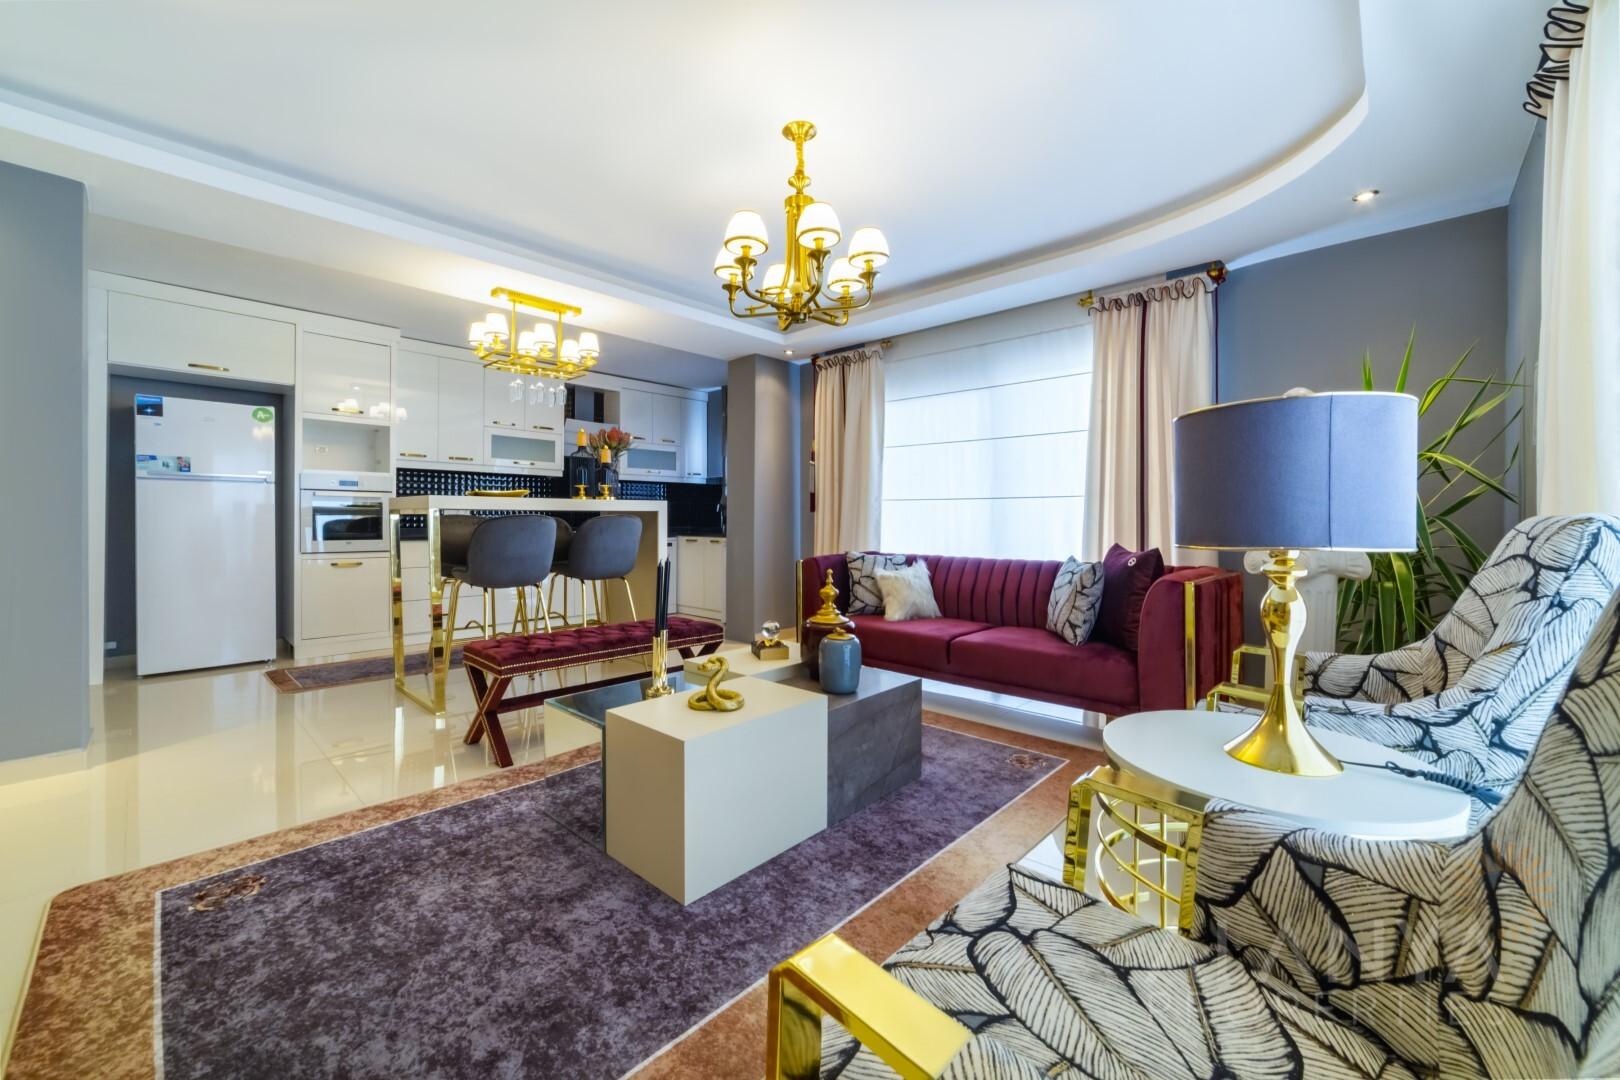 Knap Instapklaar Appartement in Mahmutlar